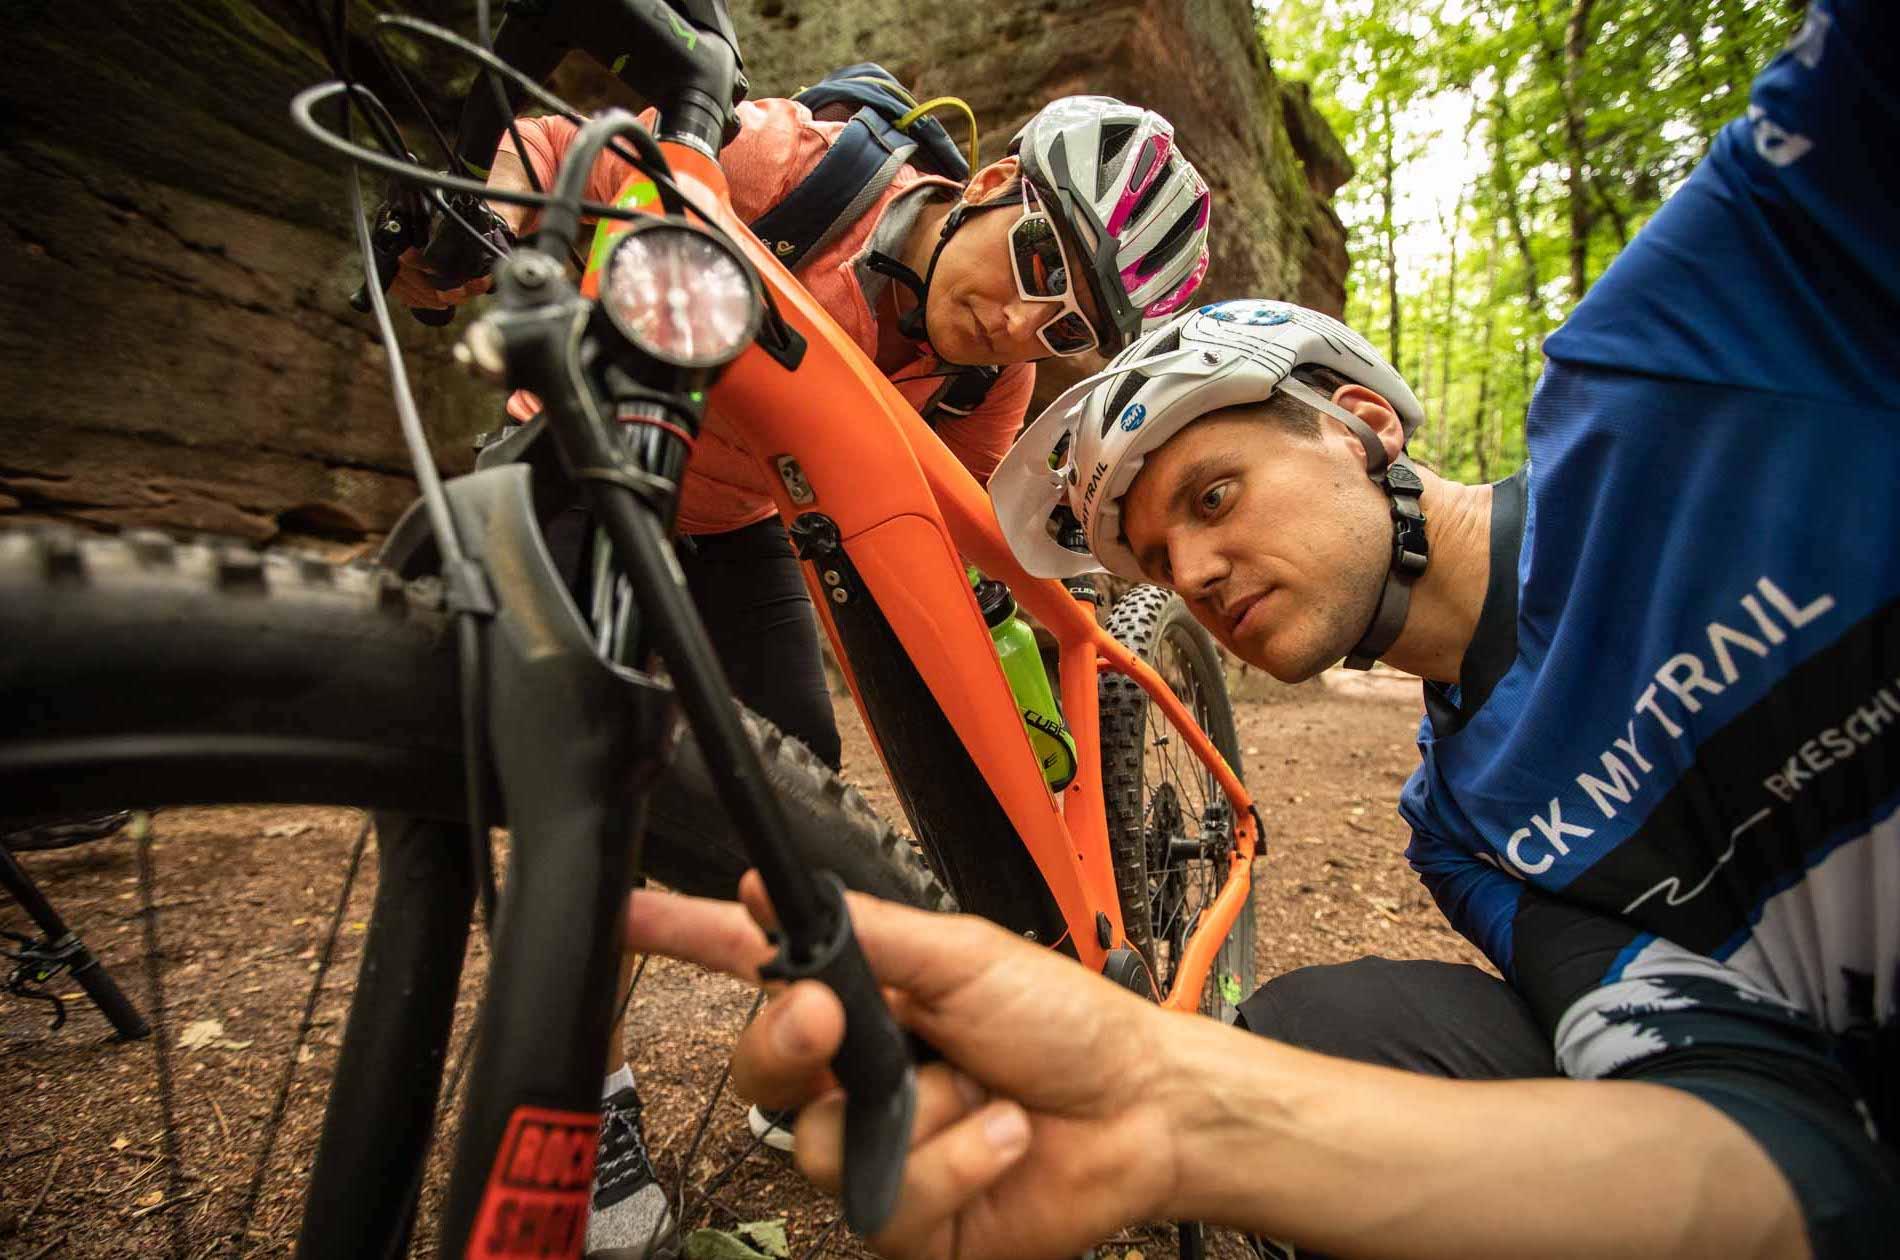 eMTB Einsteiger Fahrtechnik Kurs Solingen - Mountainbike Training - Rock my Trail